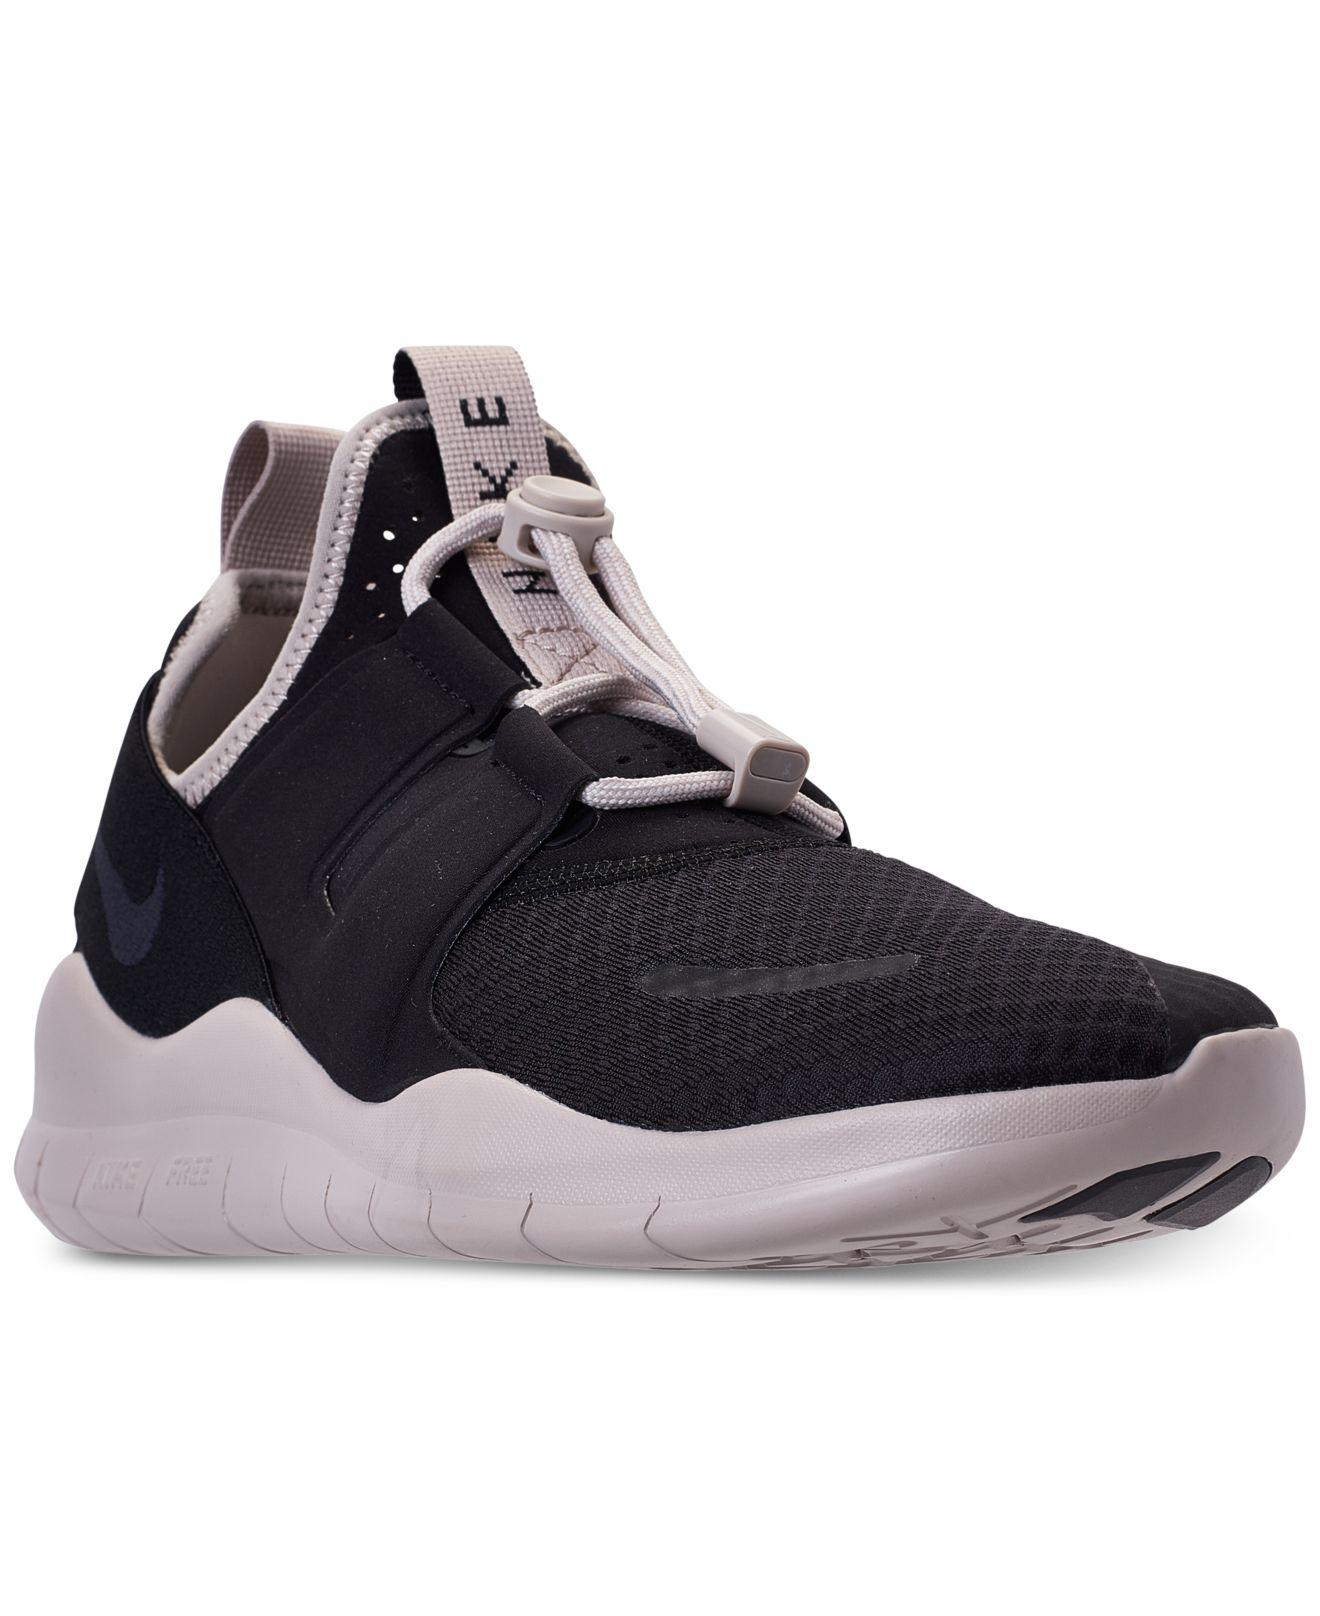 046454b298c ... 2018 womens running shoes 08ef5 b5bad  norway nike. mens black free rn  783d1 81e41